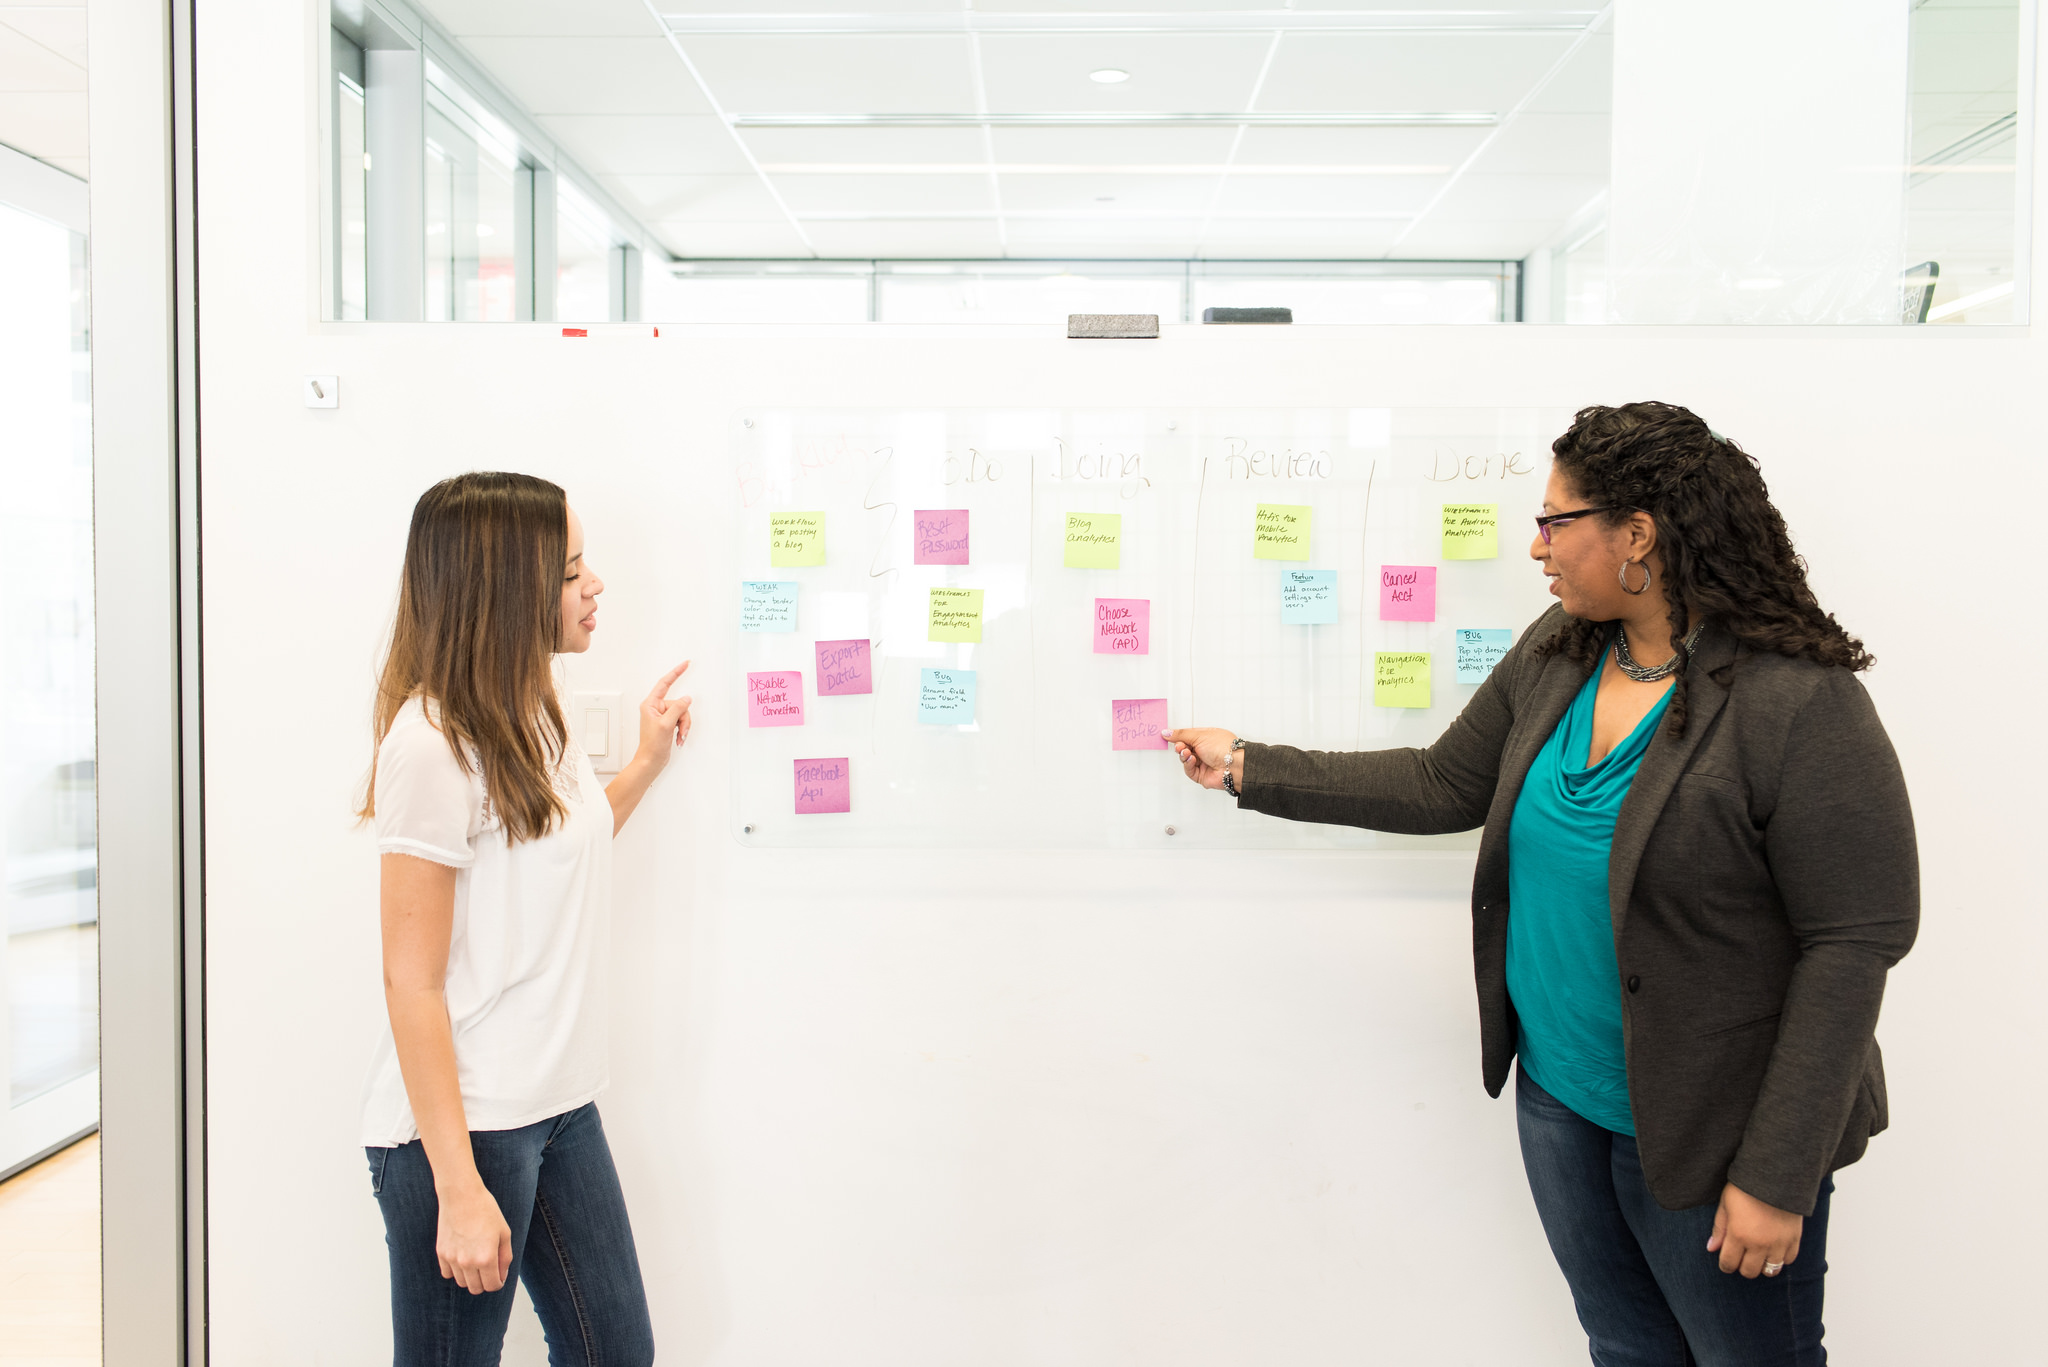 API platform maturity - picture wocintechchat.com